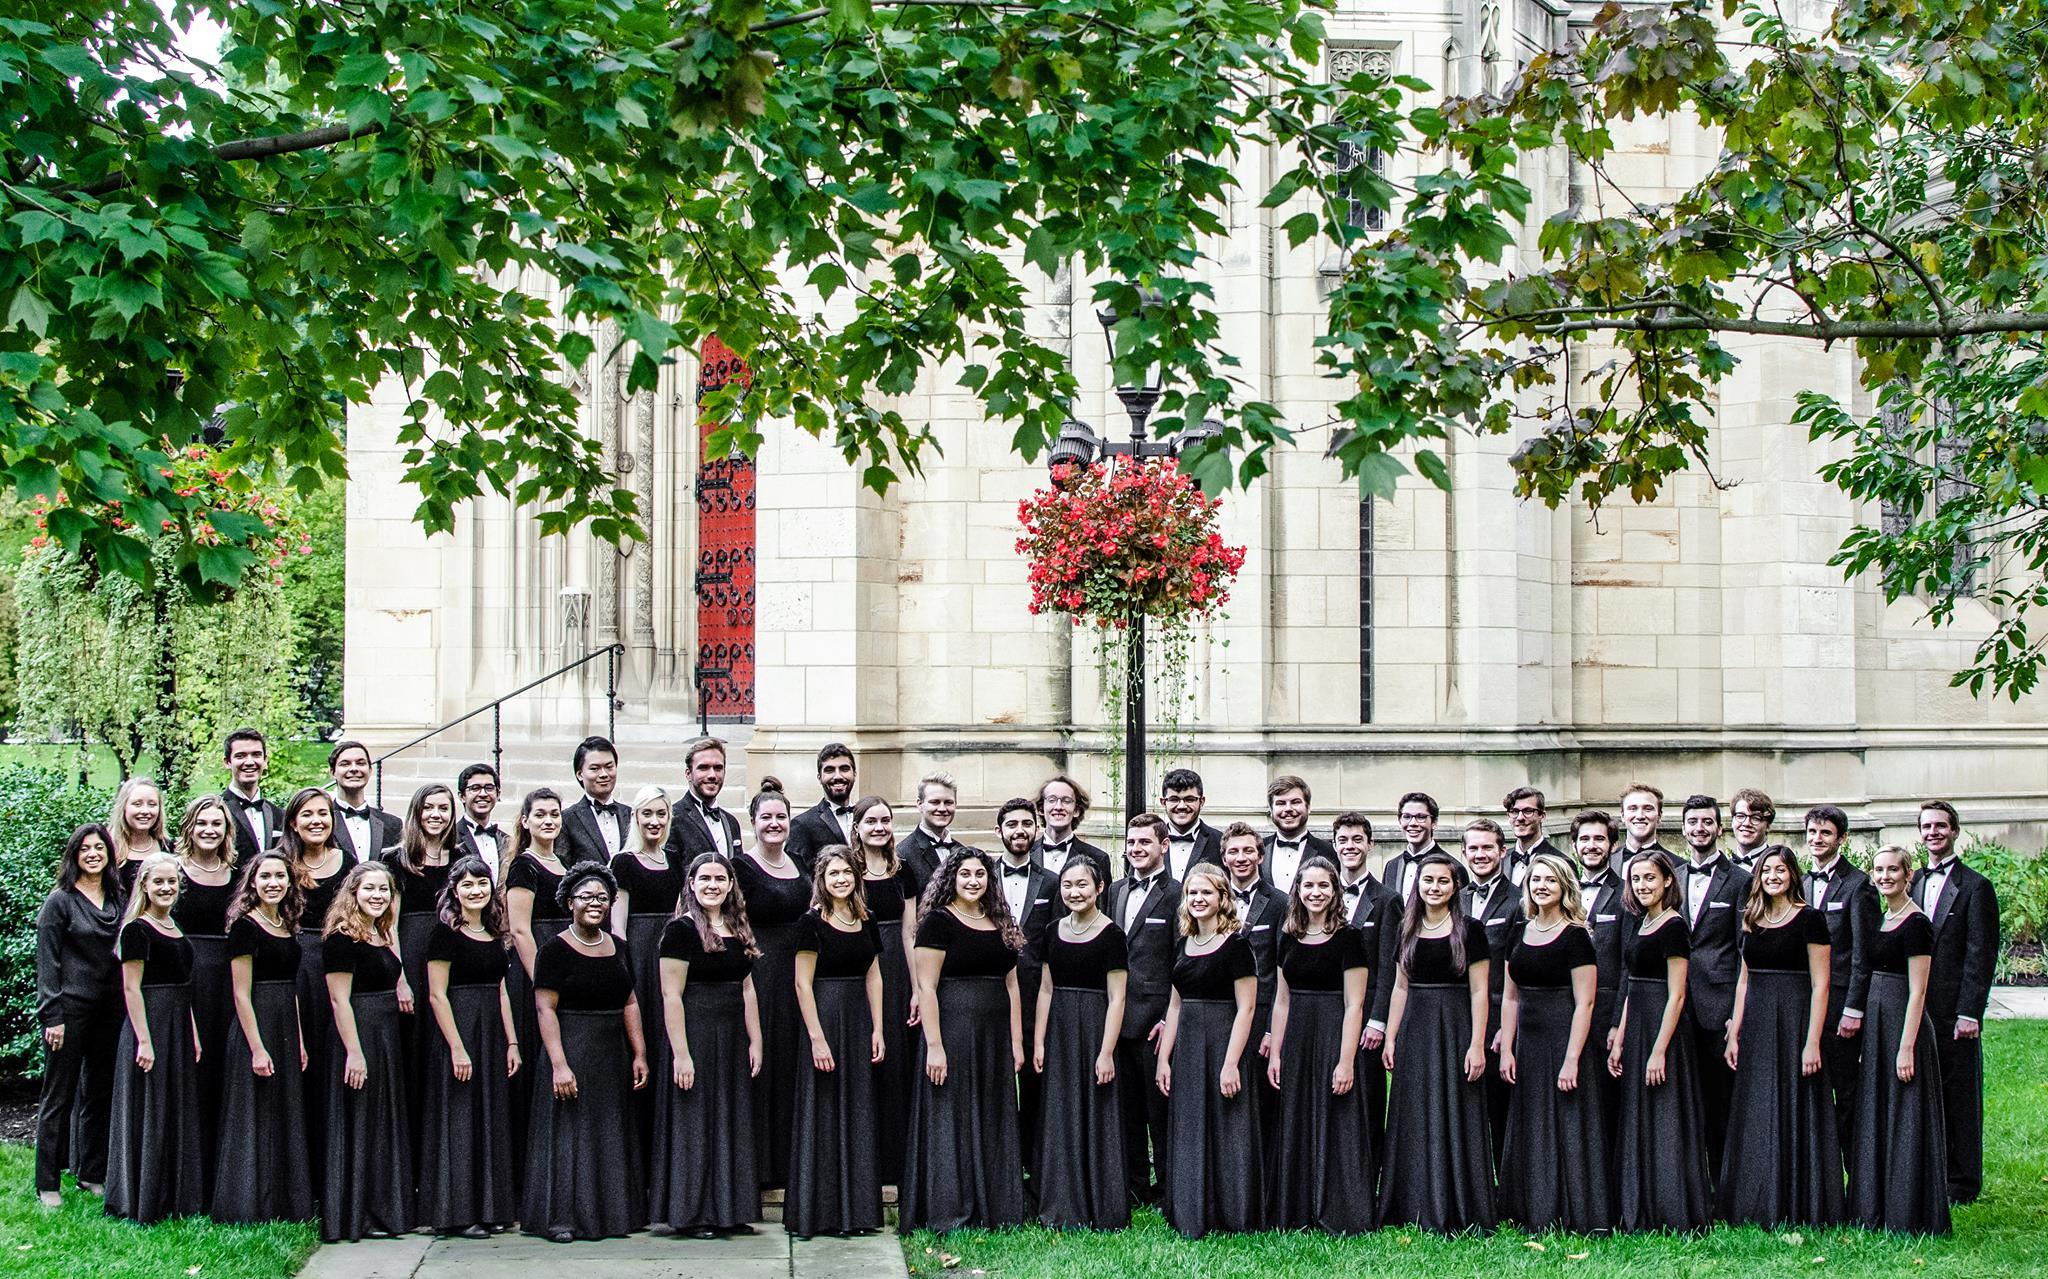 Heinz Chapel Choir 80th Anniversary Concert